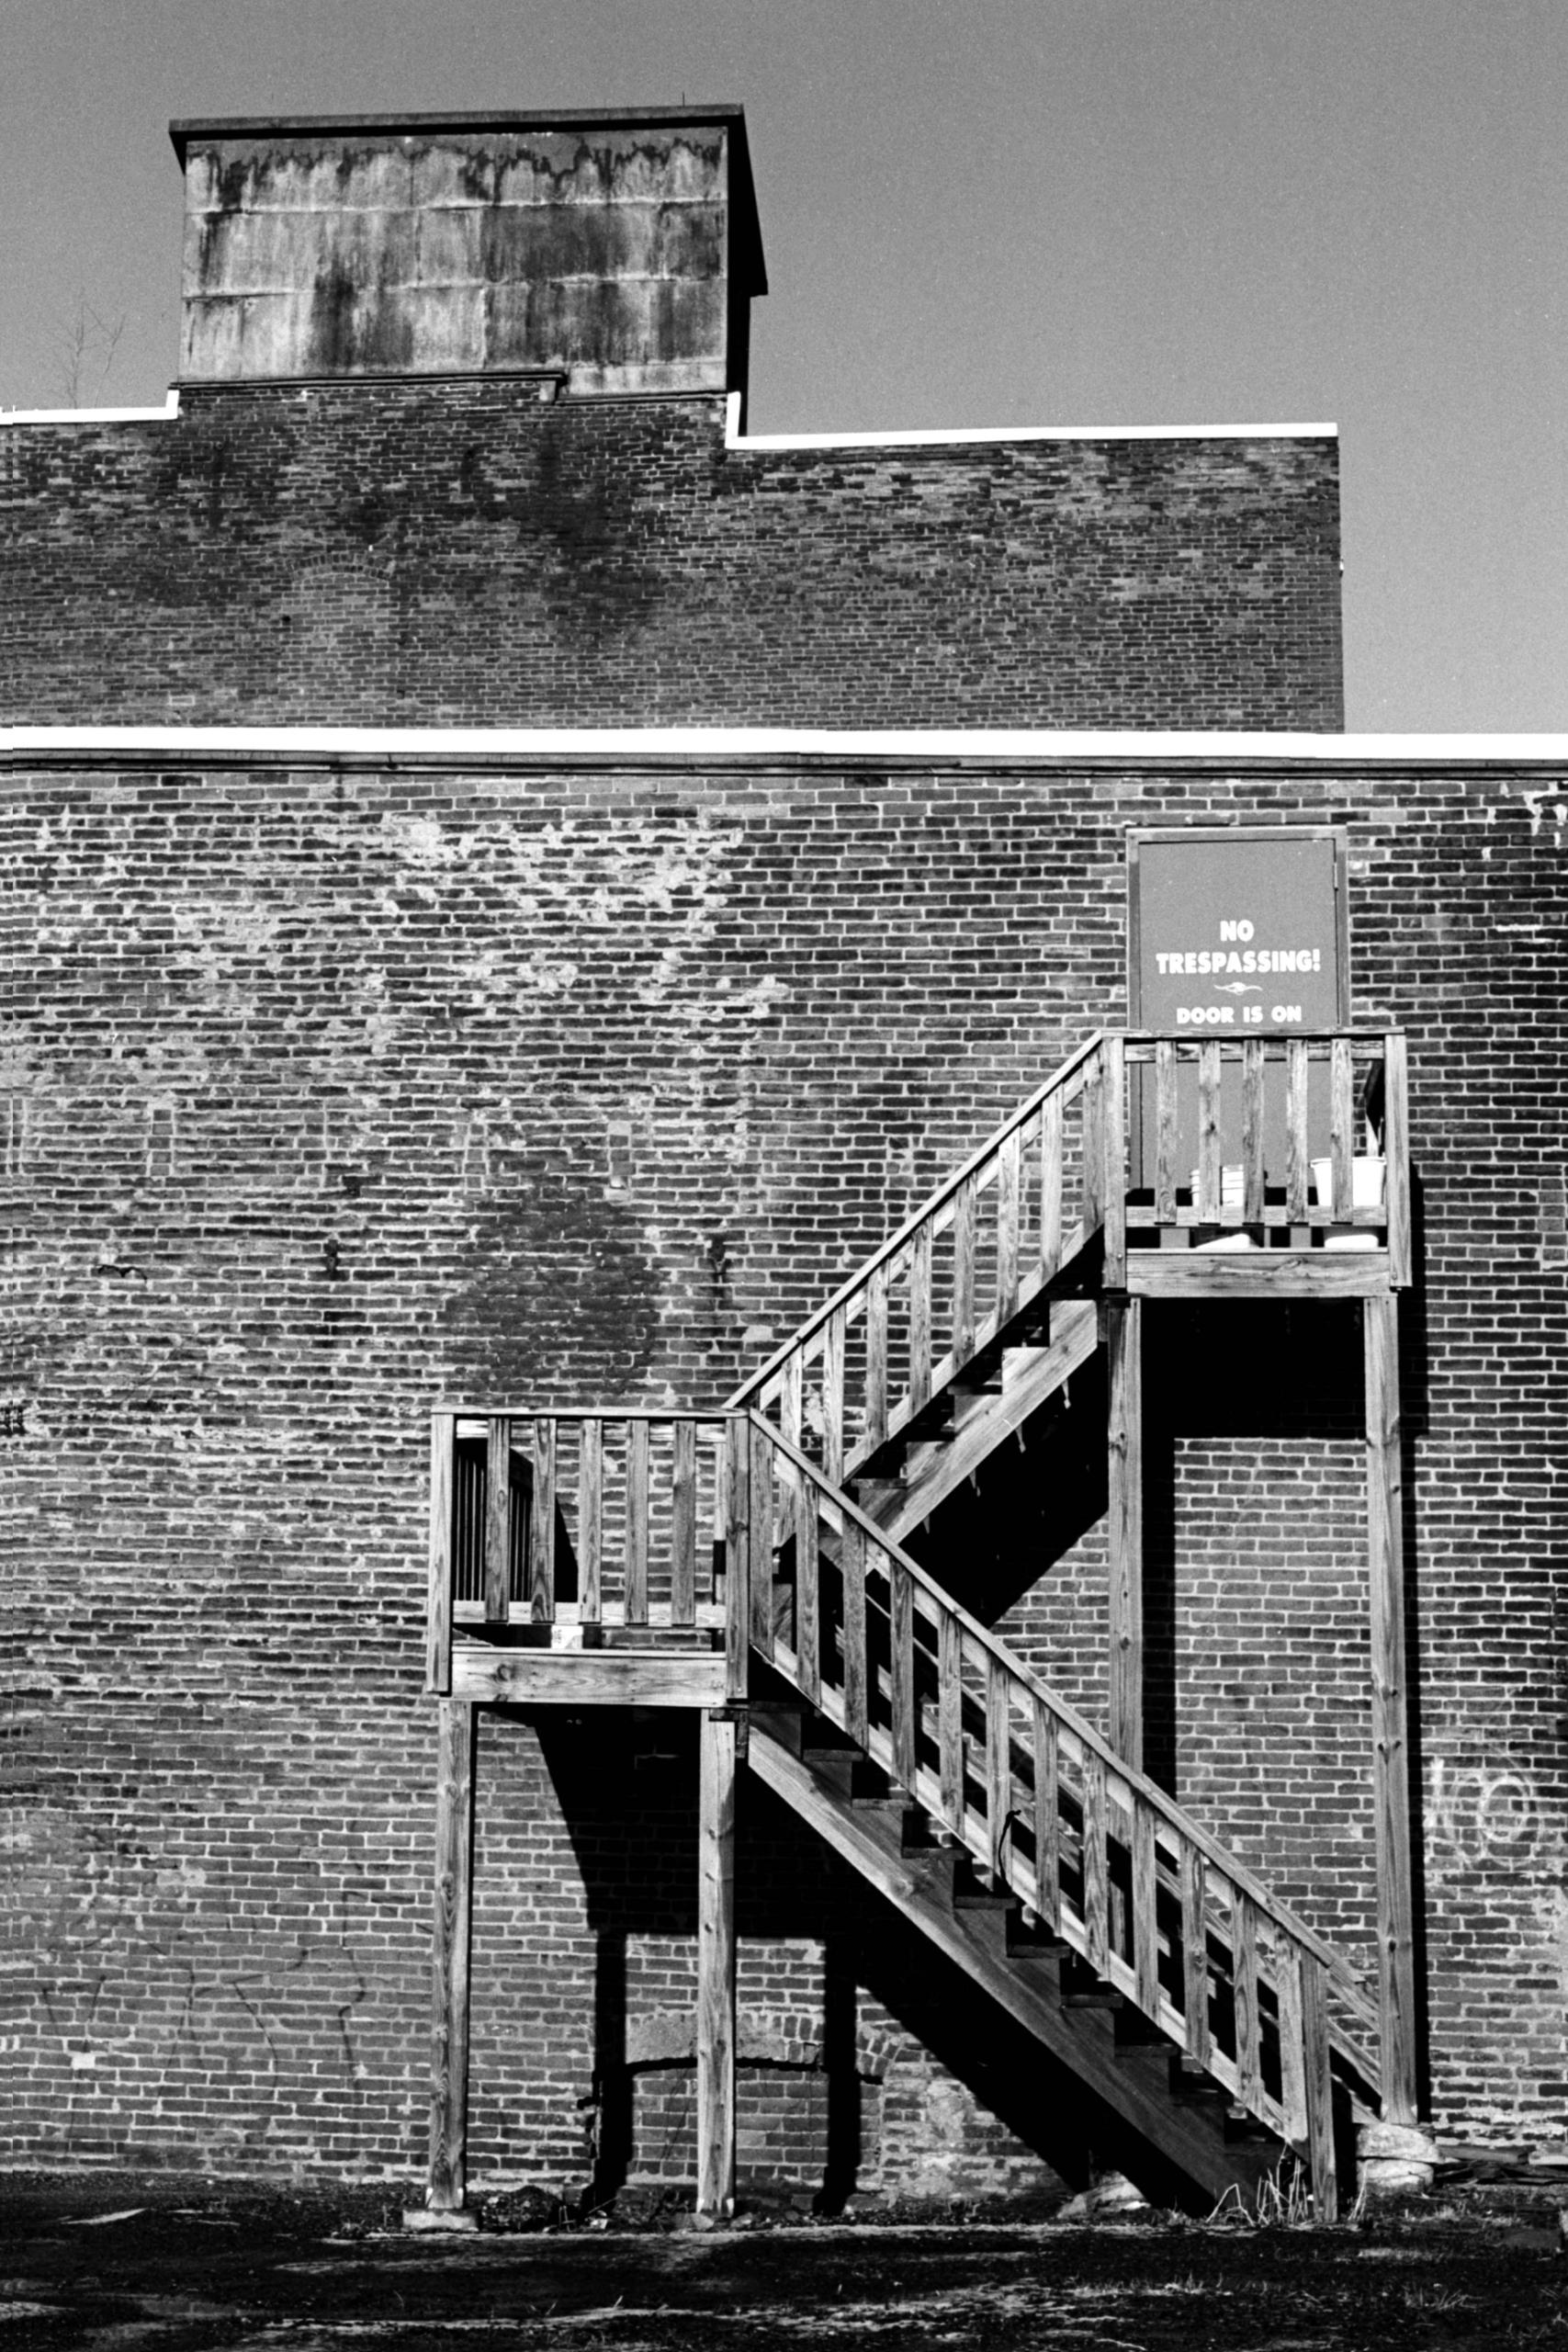 stairway heaven lock alarmed cr - marty1107 | ello